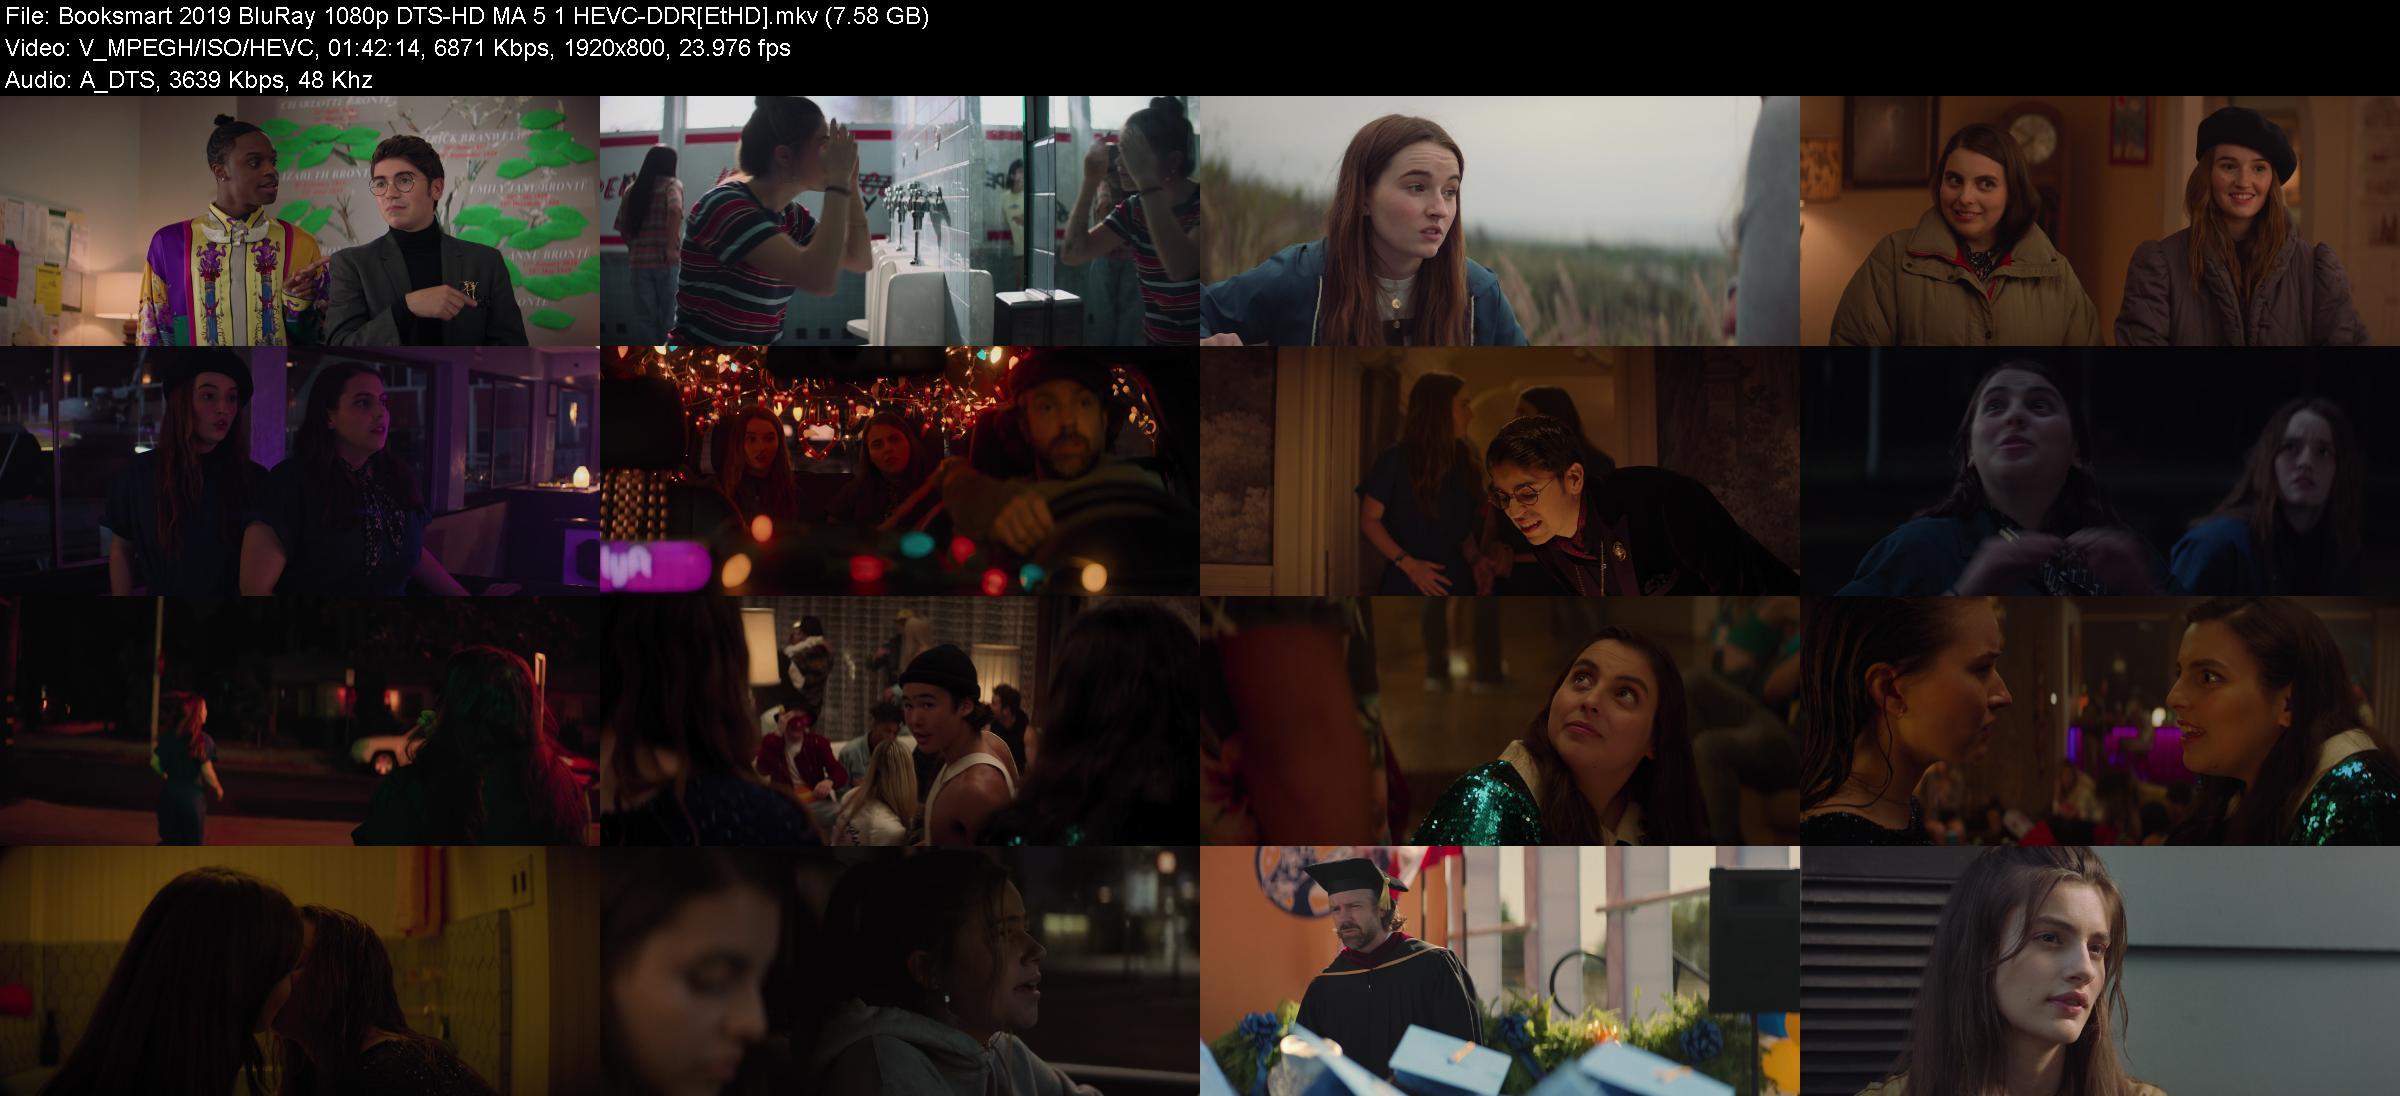 Booksmart 2019 BluRay 1080p DTS-HD MA 5 1 HEVC-DDR